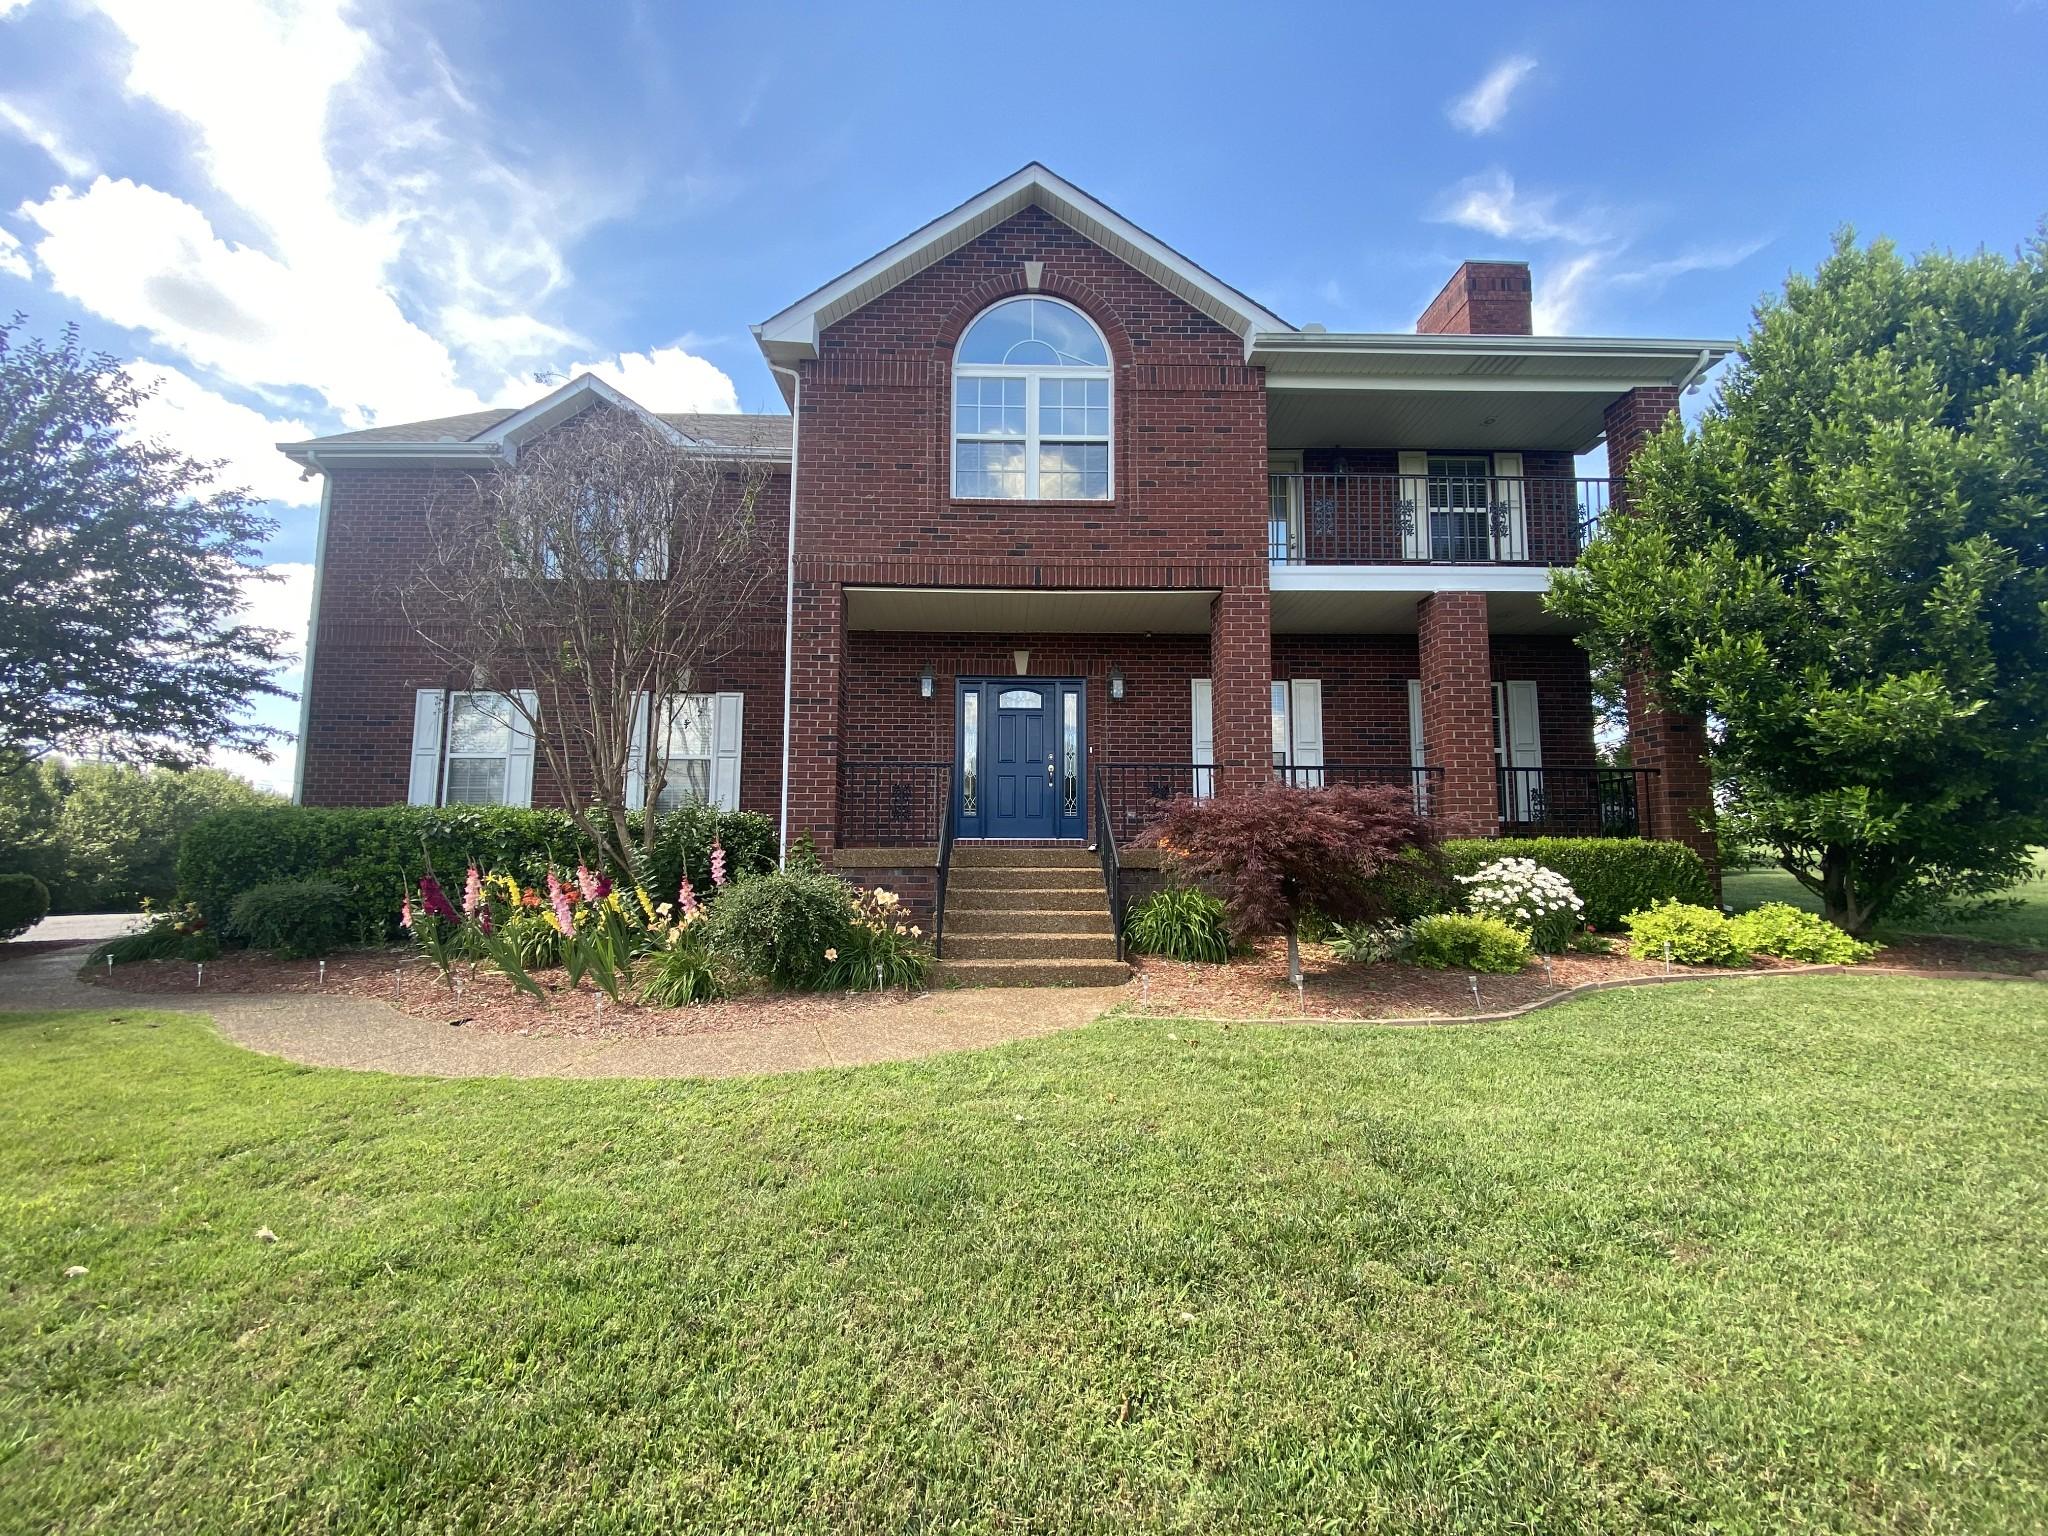 101 Meadowood Loop Property Photo - Burns, TN real estate listing